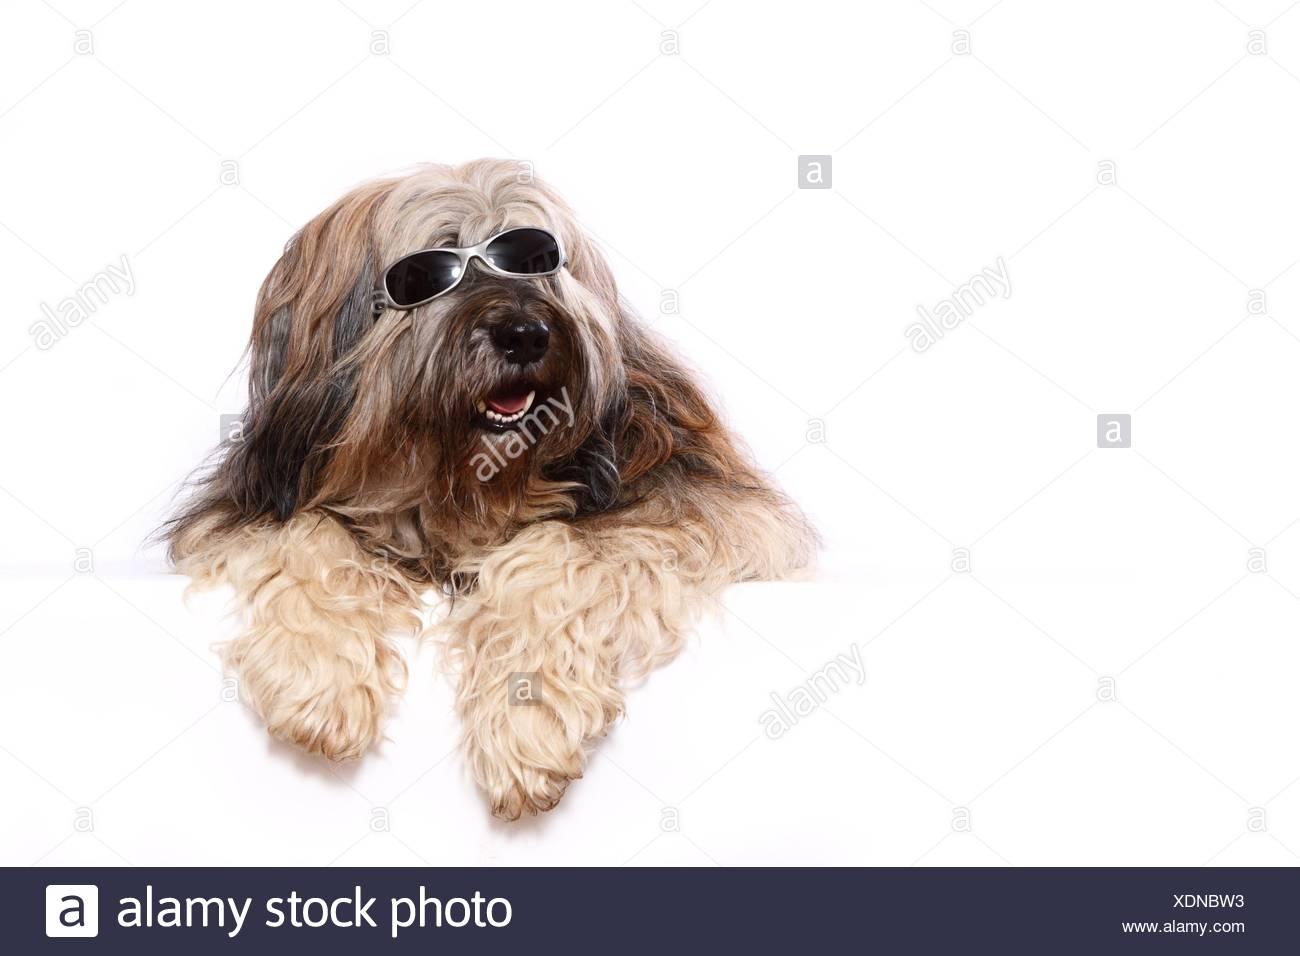 lying Tibetan Terrier - Stock Image